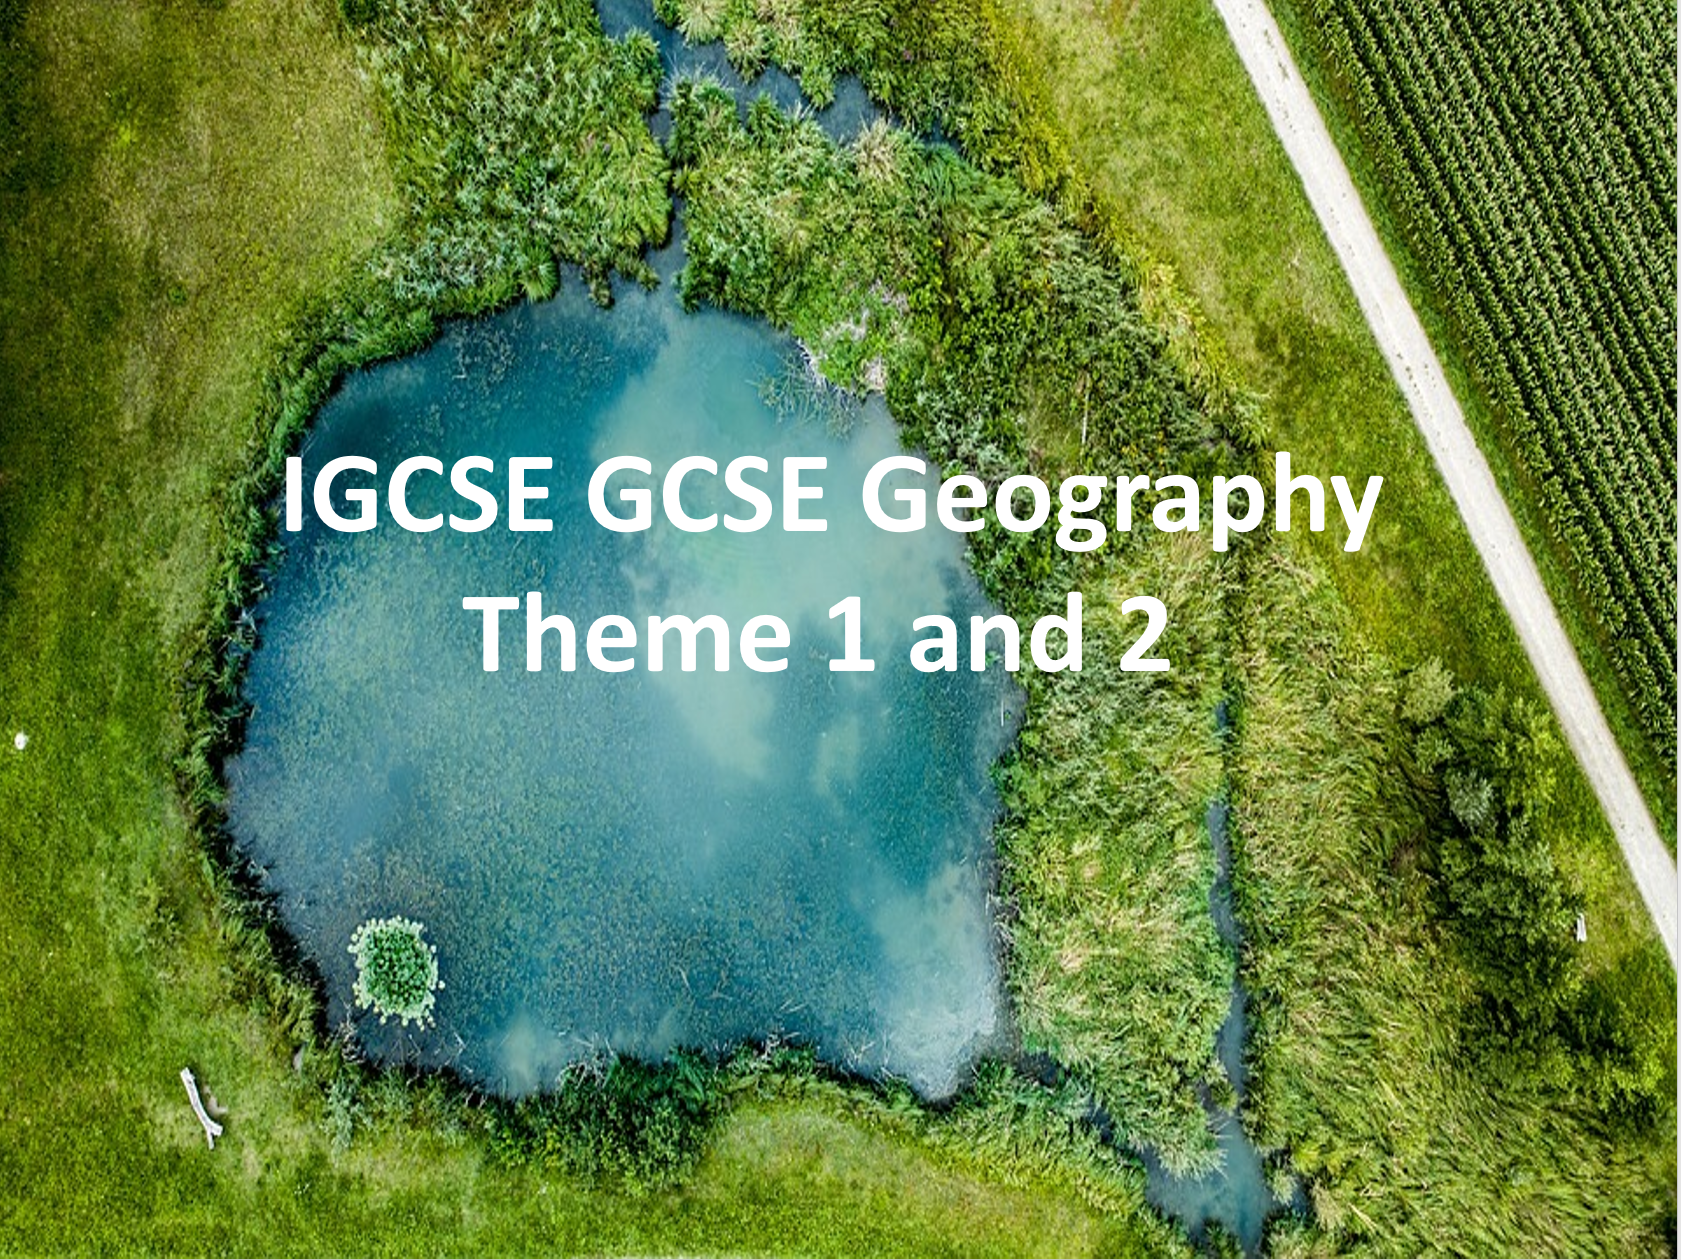 IGCSE Theme 1 and 2